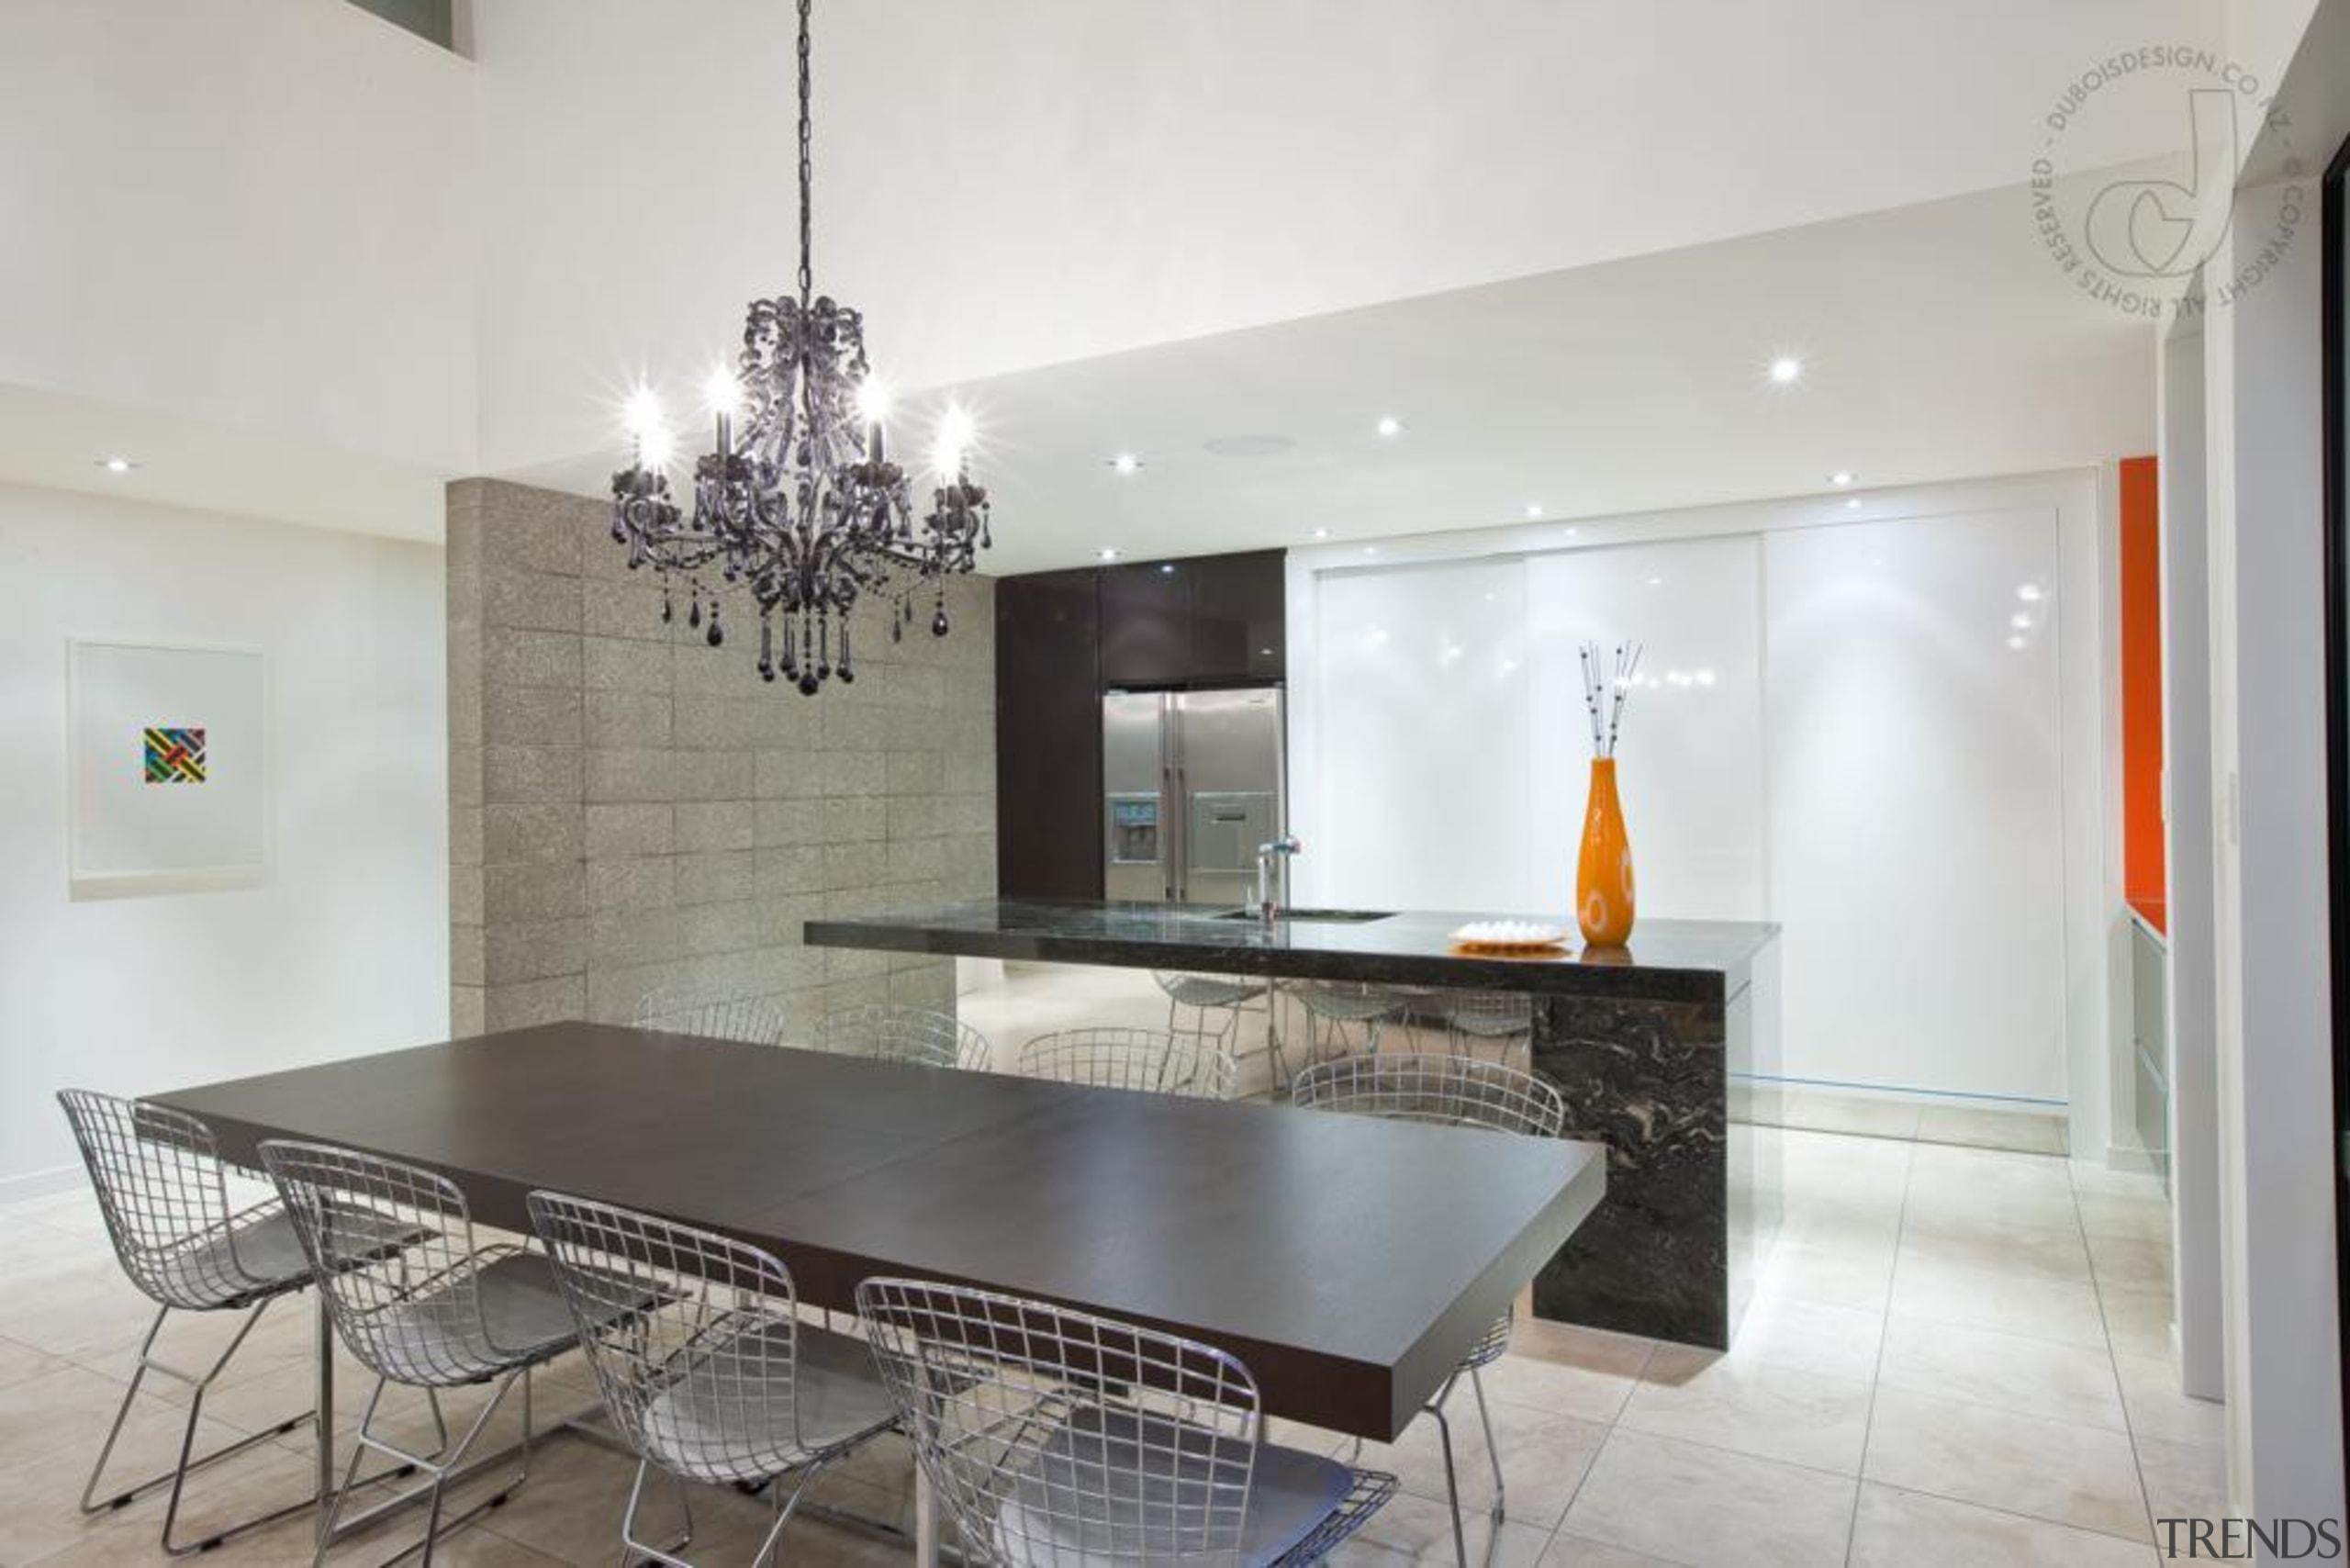 Simplistic Kitchen - Simplistic Kitchen - architecture | architecture, countertop, dining room, interior design, kitchen, property, real estate, table, gray, white